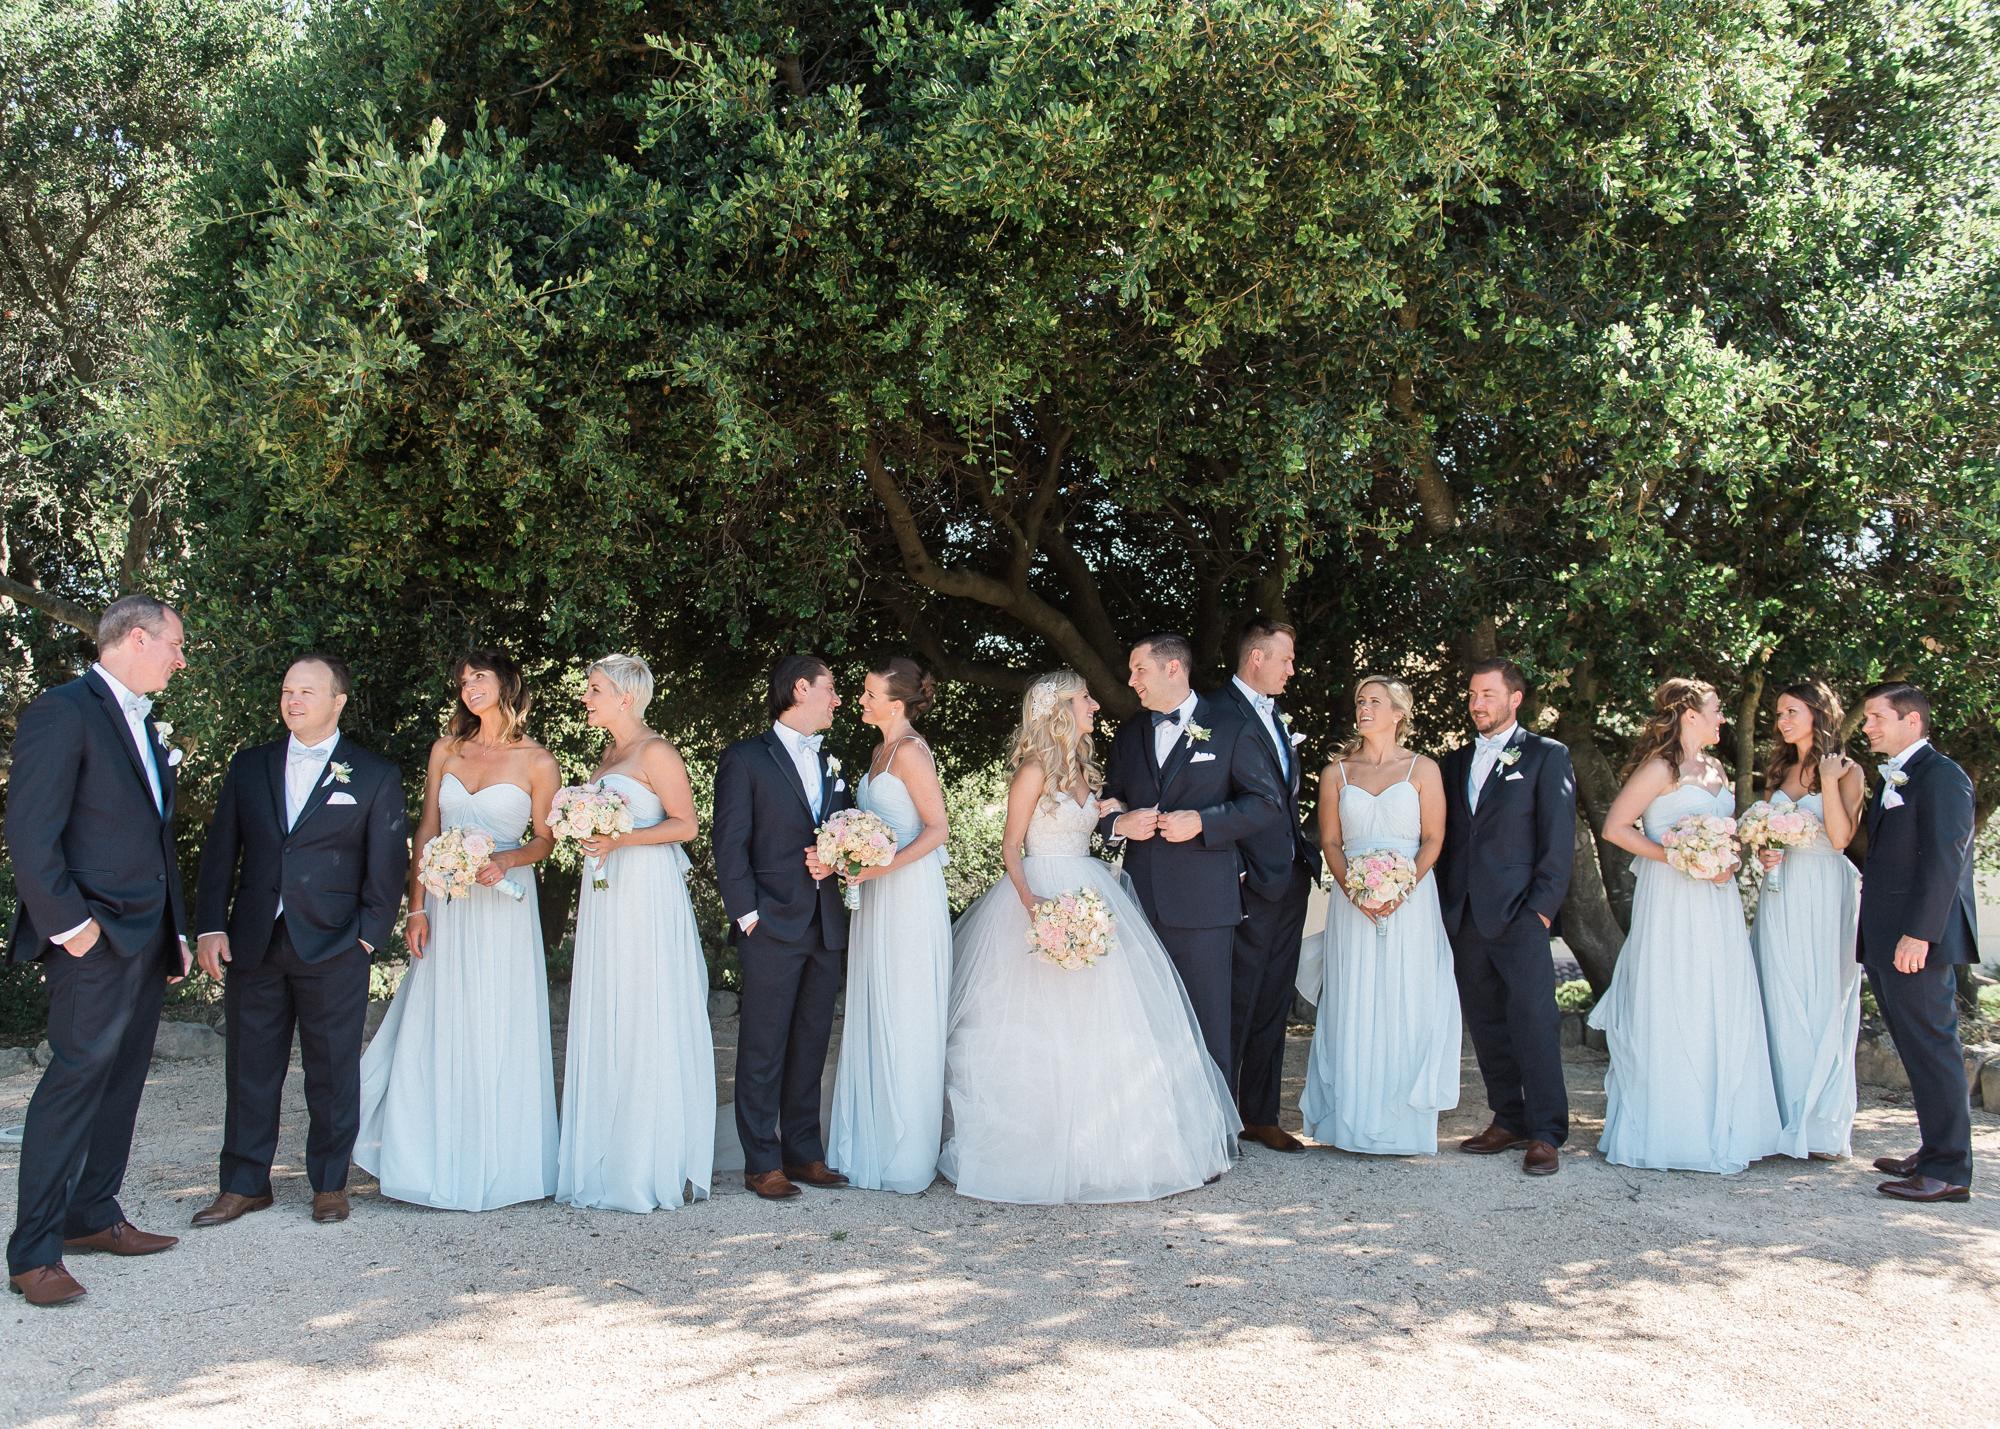 Aimee+Logan_wedding_spp-53.jpg